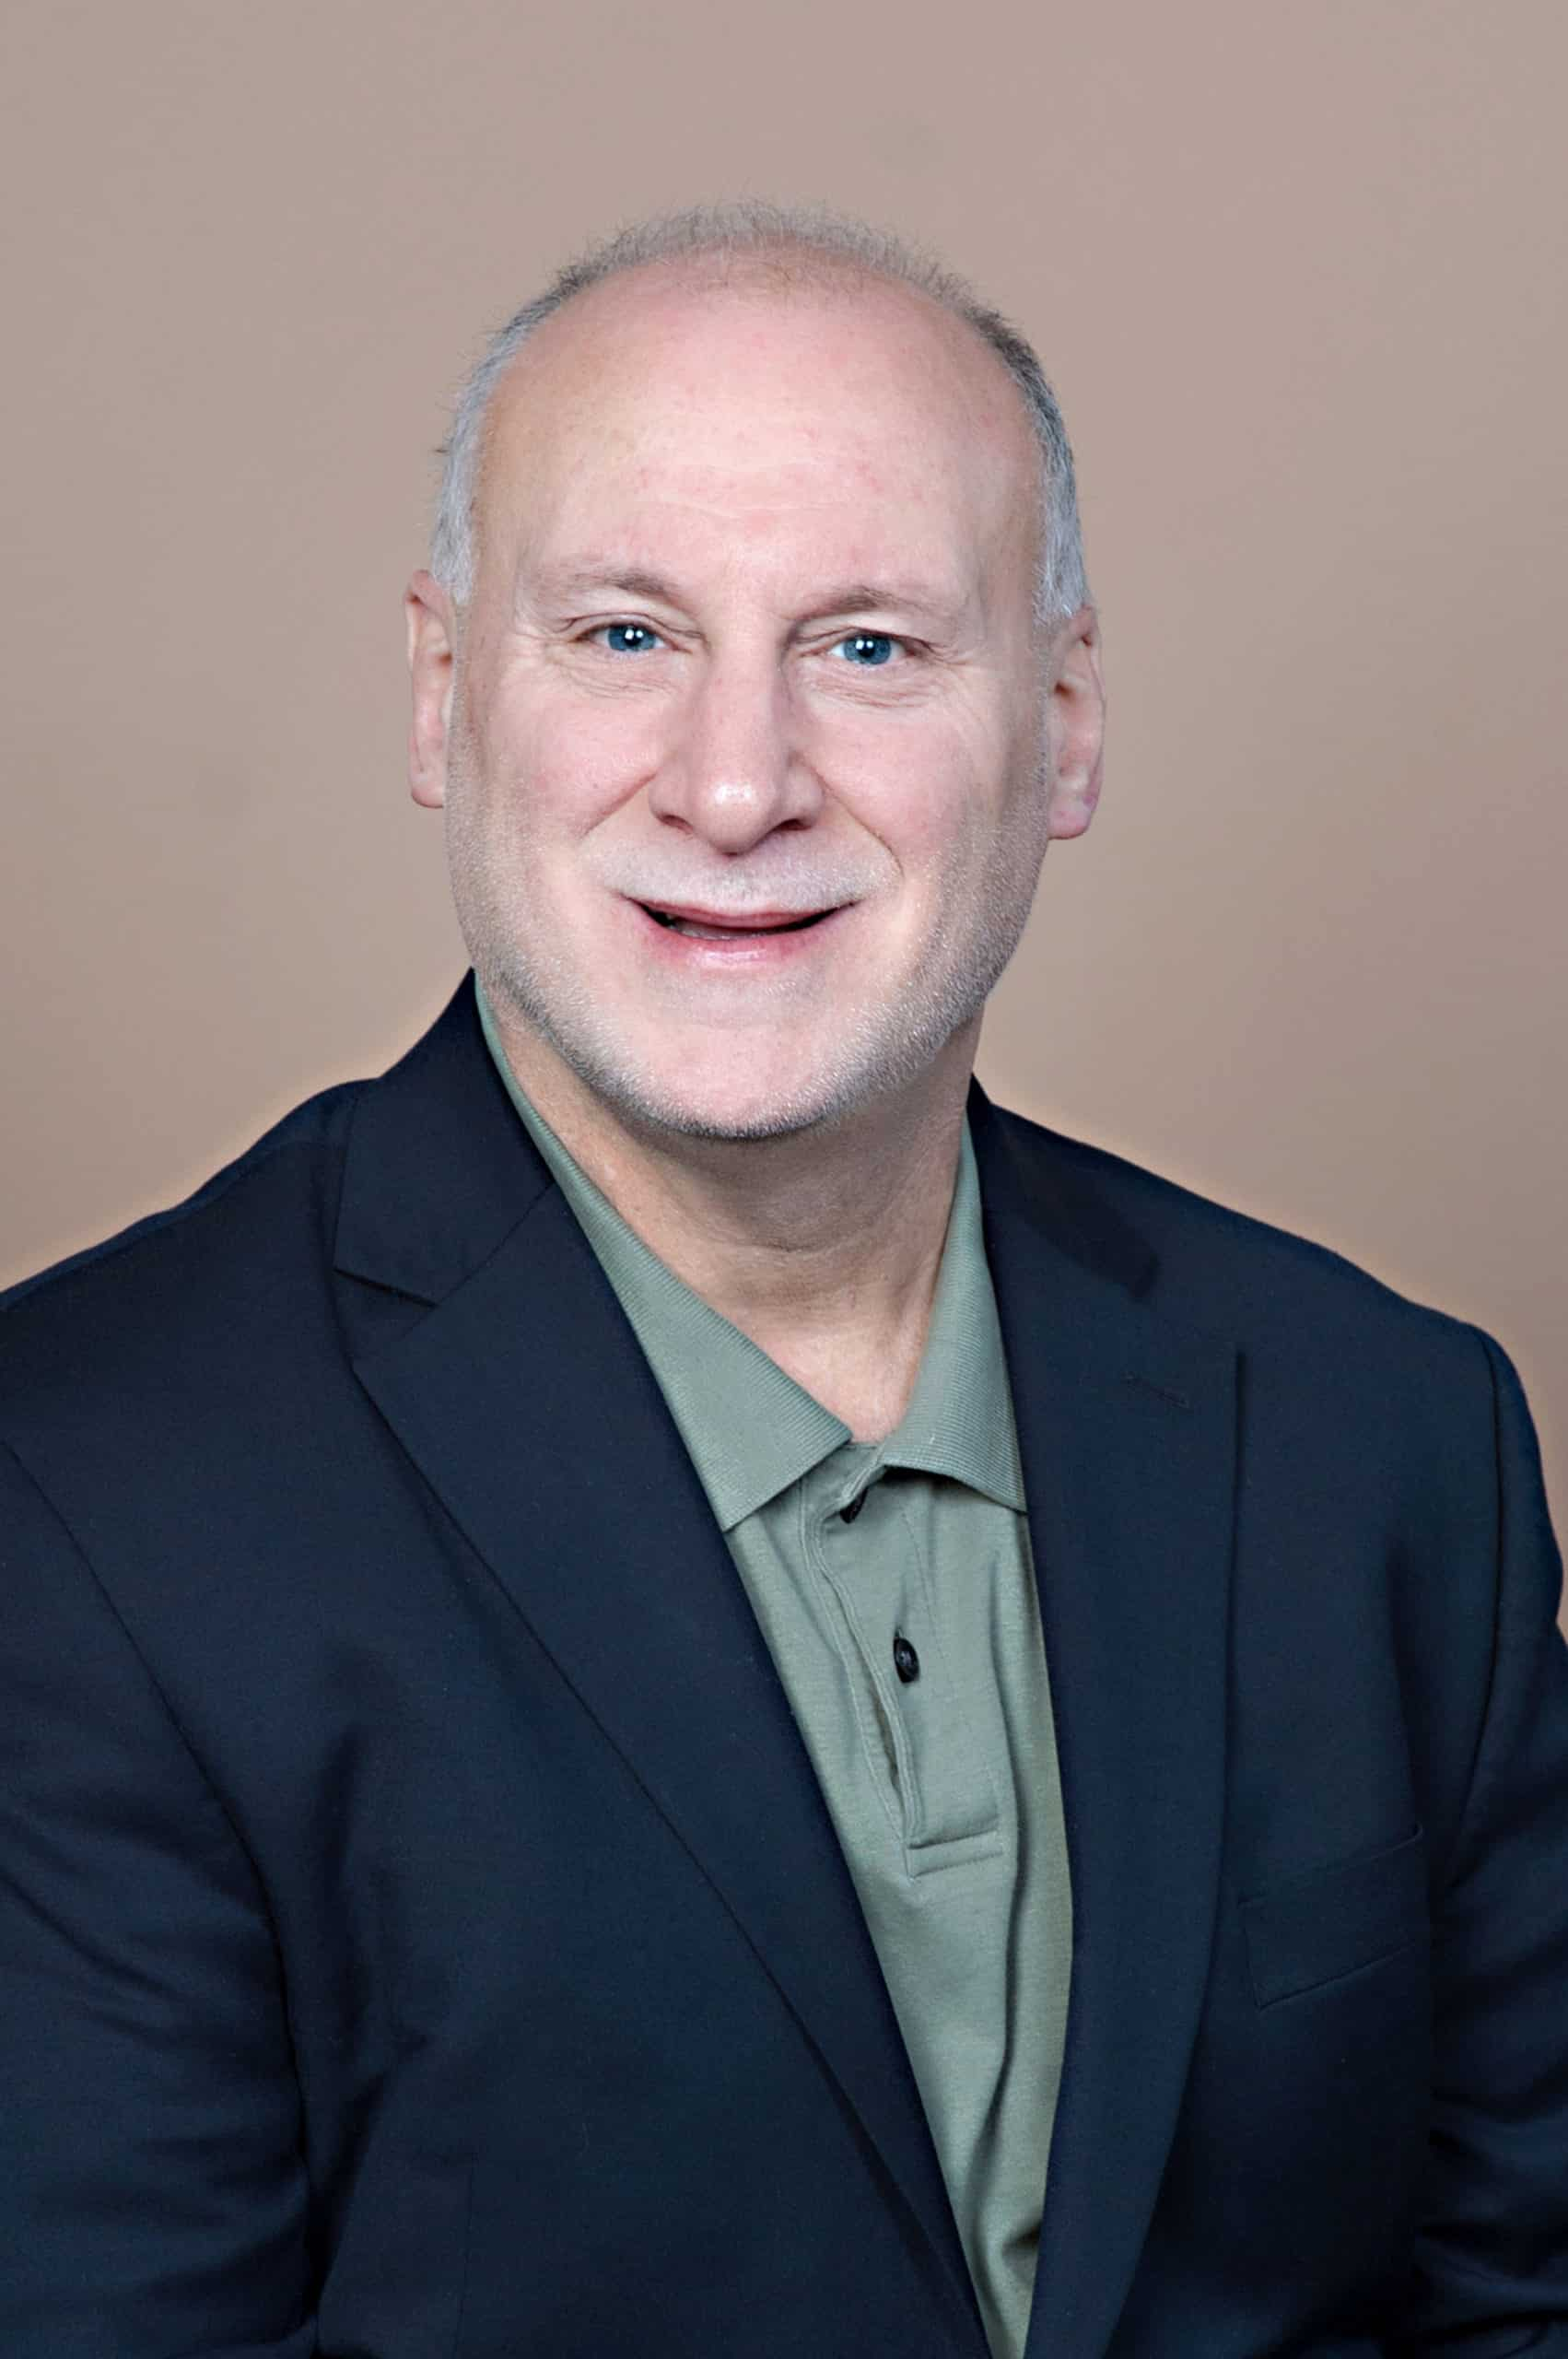 REV. DR. DAVID RICCI